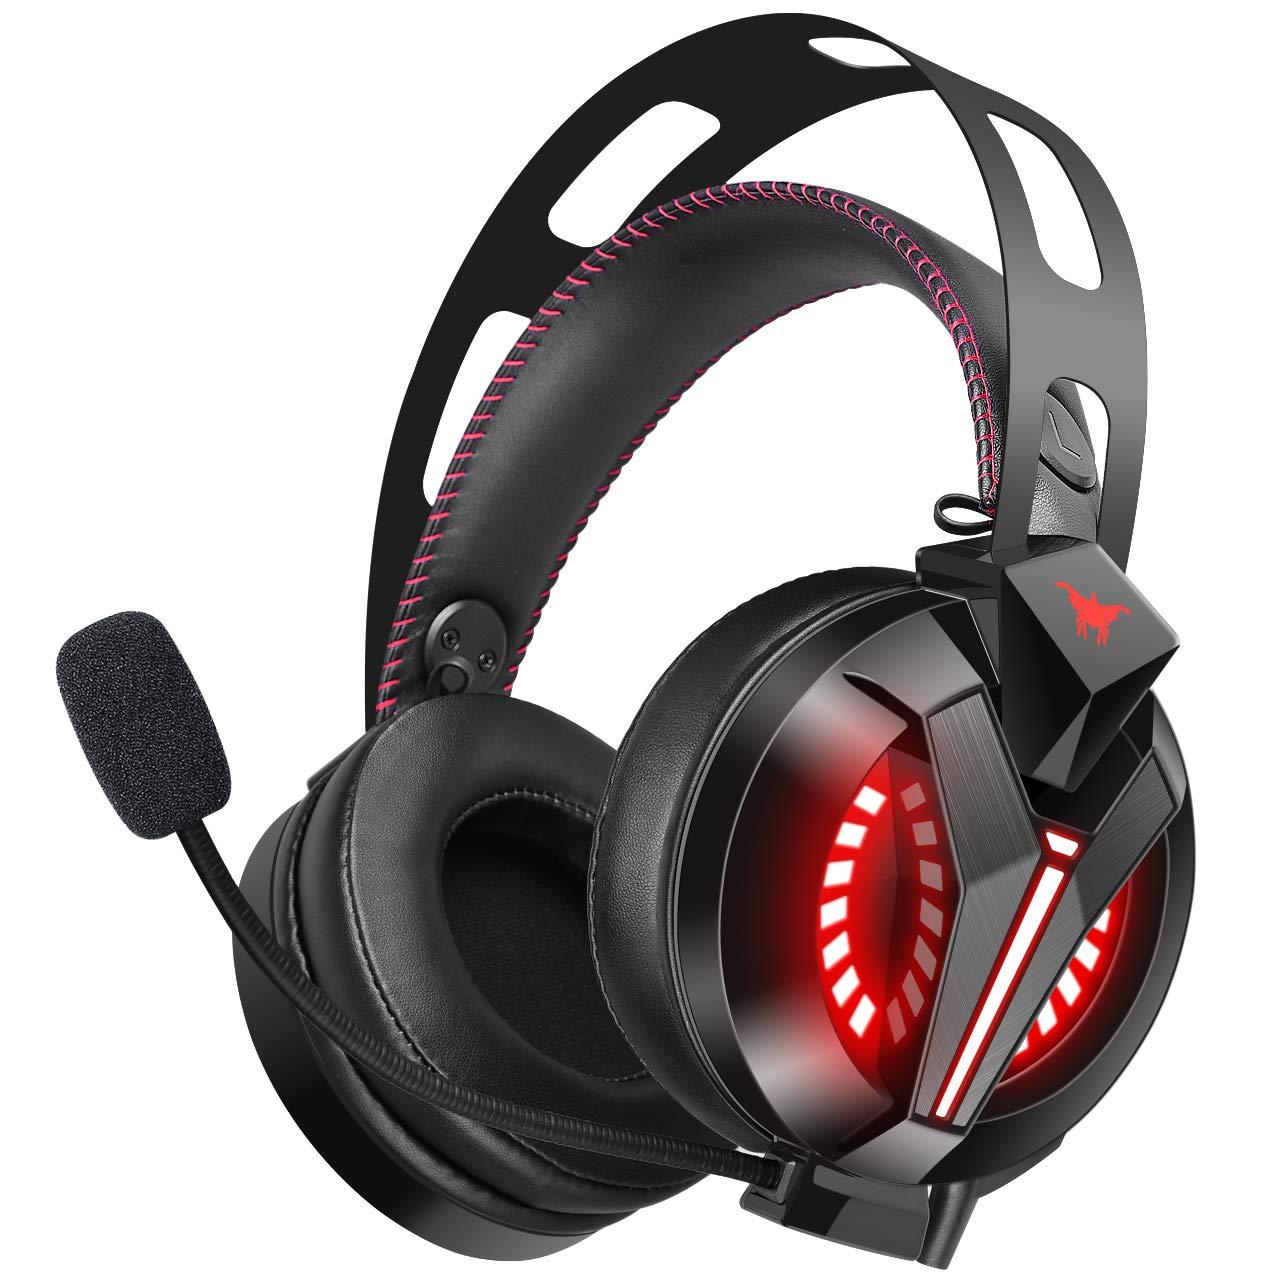 Auriculares Gaming Con Iluminacion Led, Combatwing (xmp)